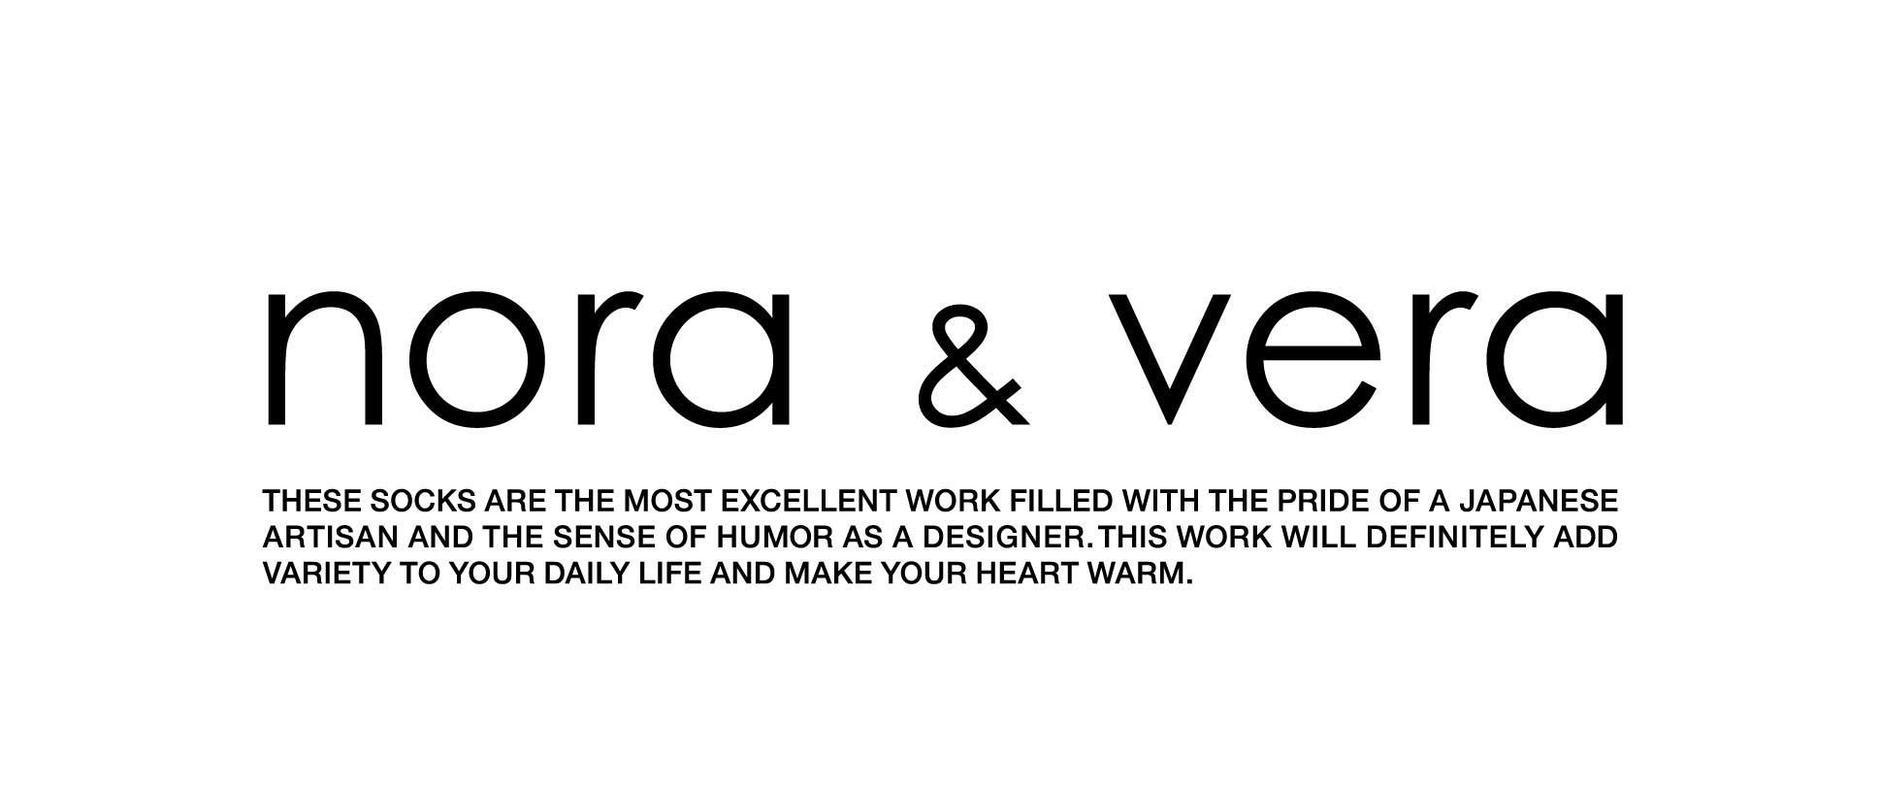 nora&vera